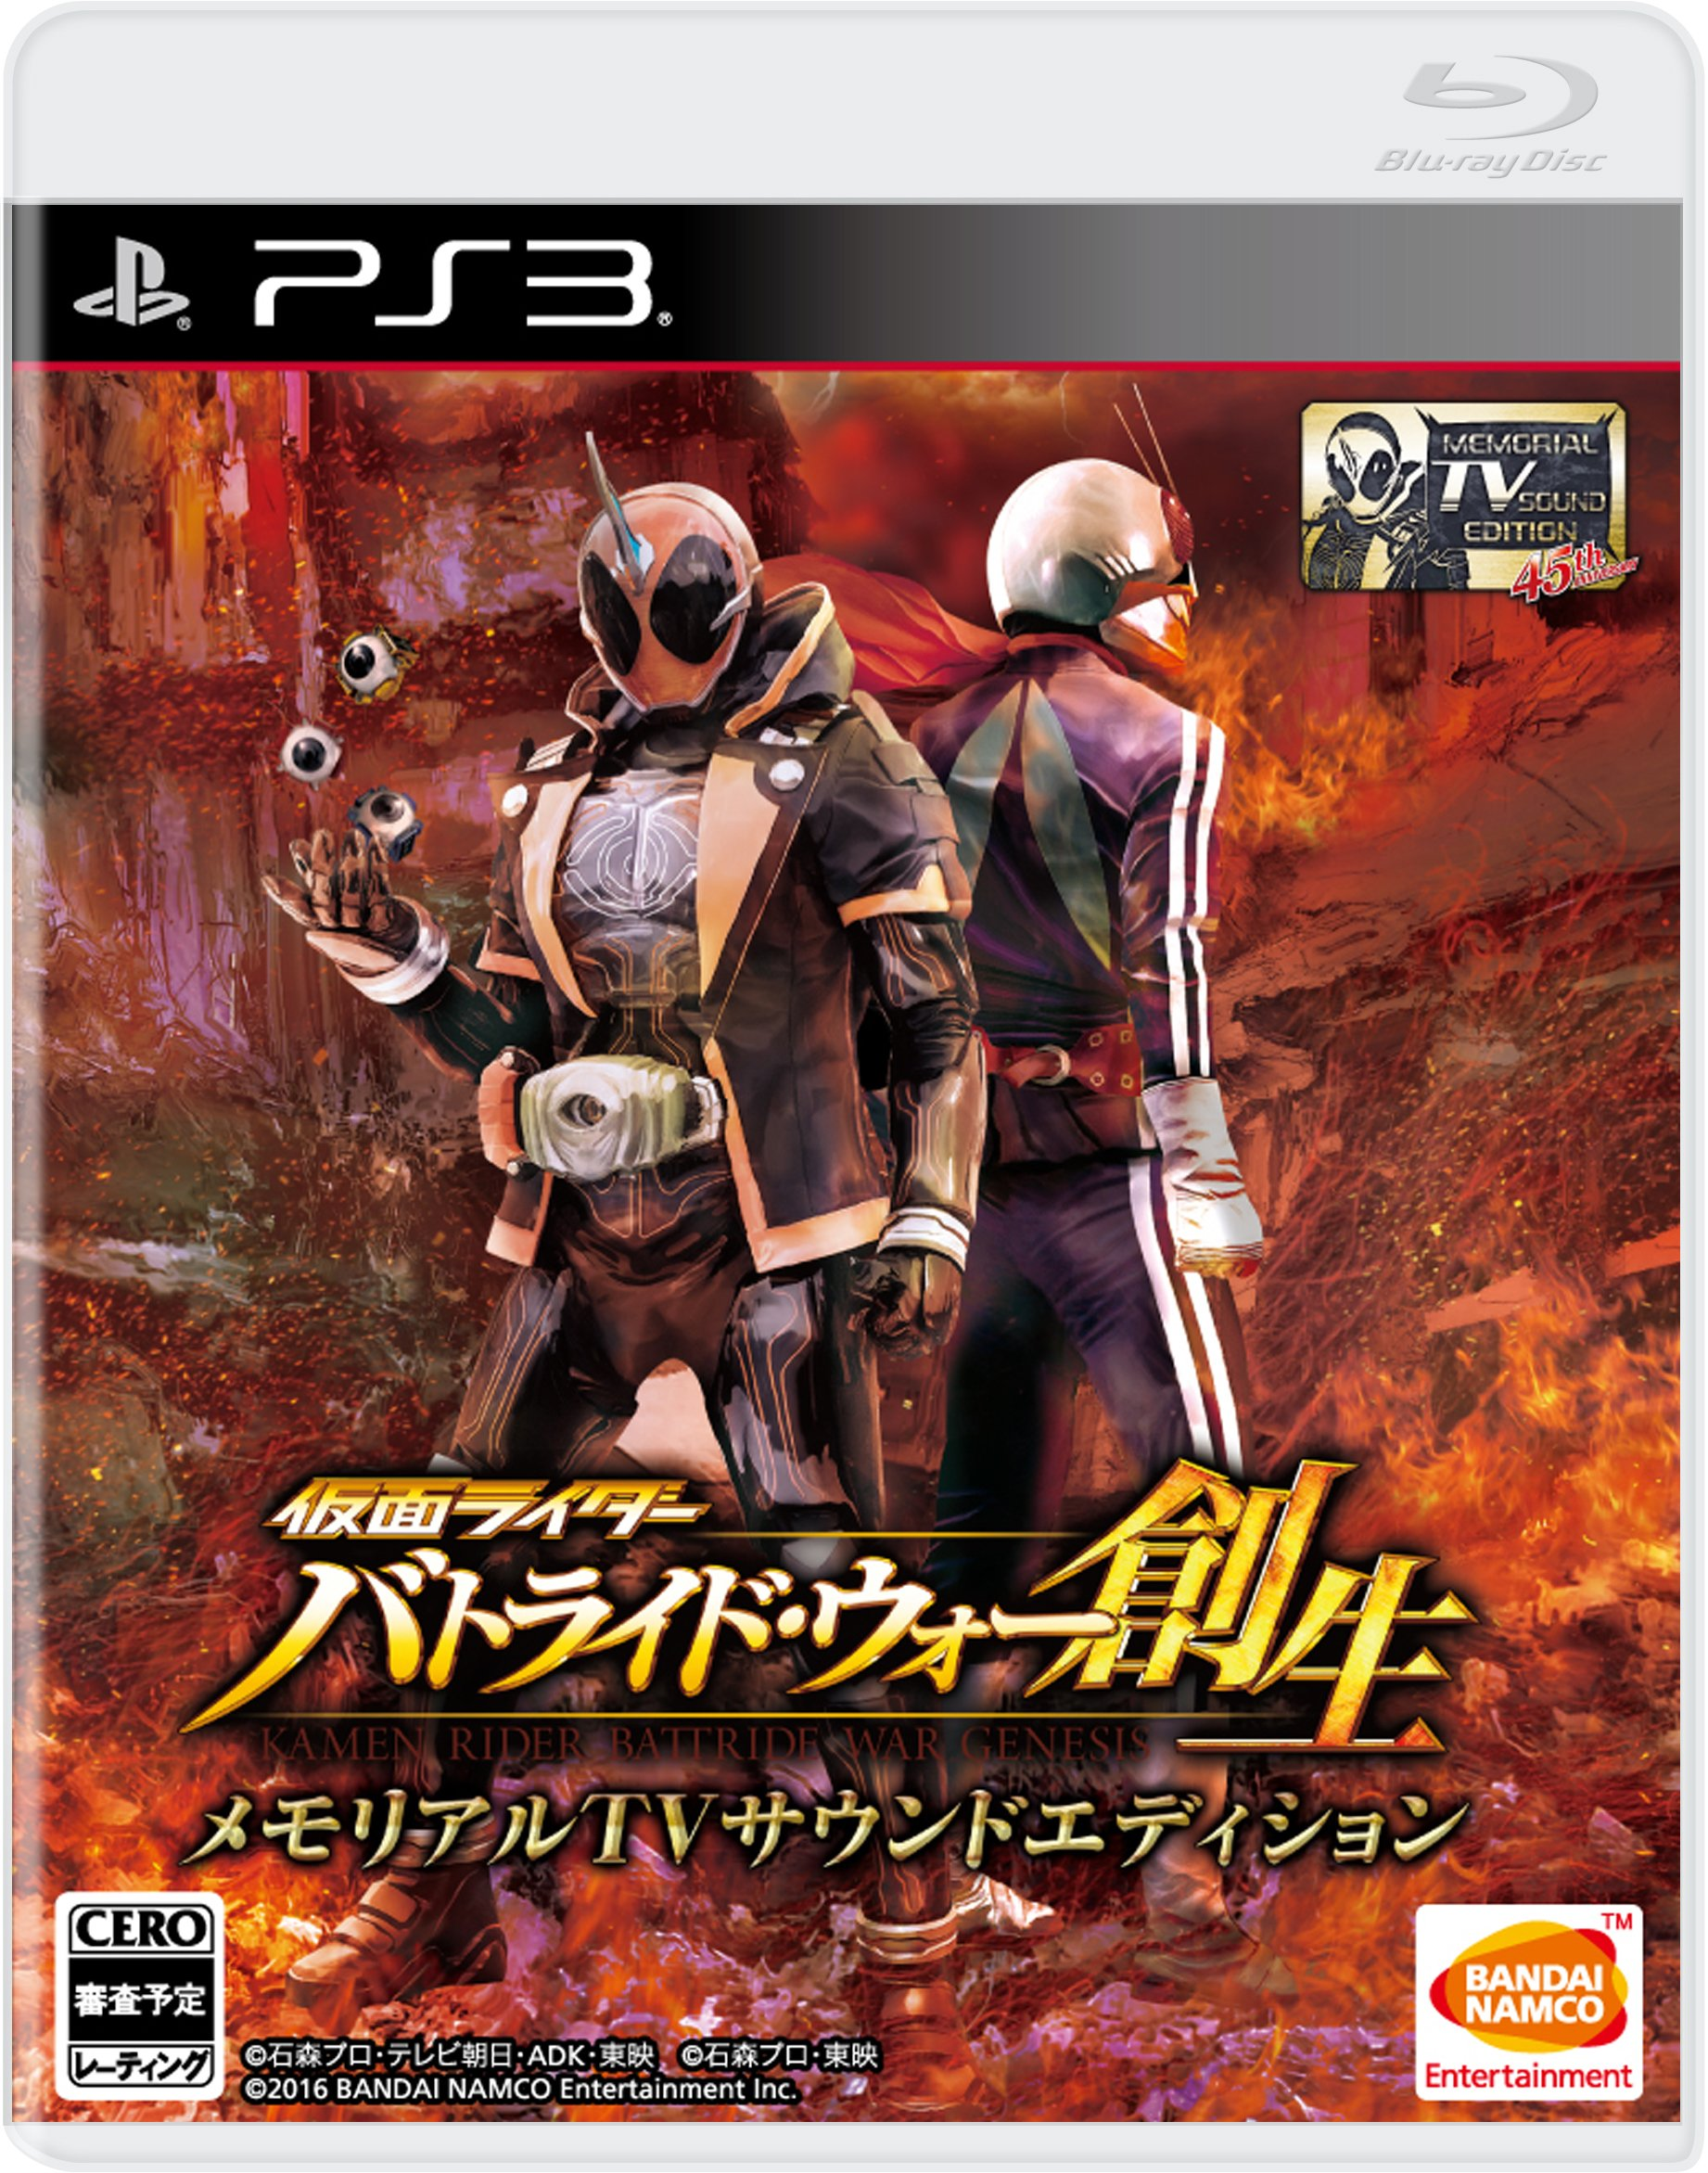 Kamen Rider: Battride War Creation Japanese Ver. (Limited edition) by Bandai (Image #1)